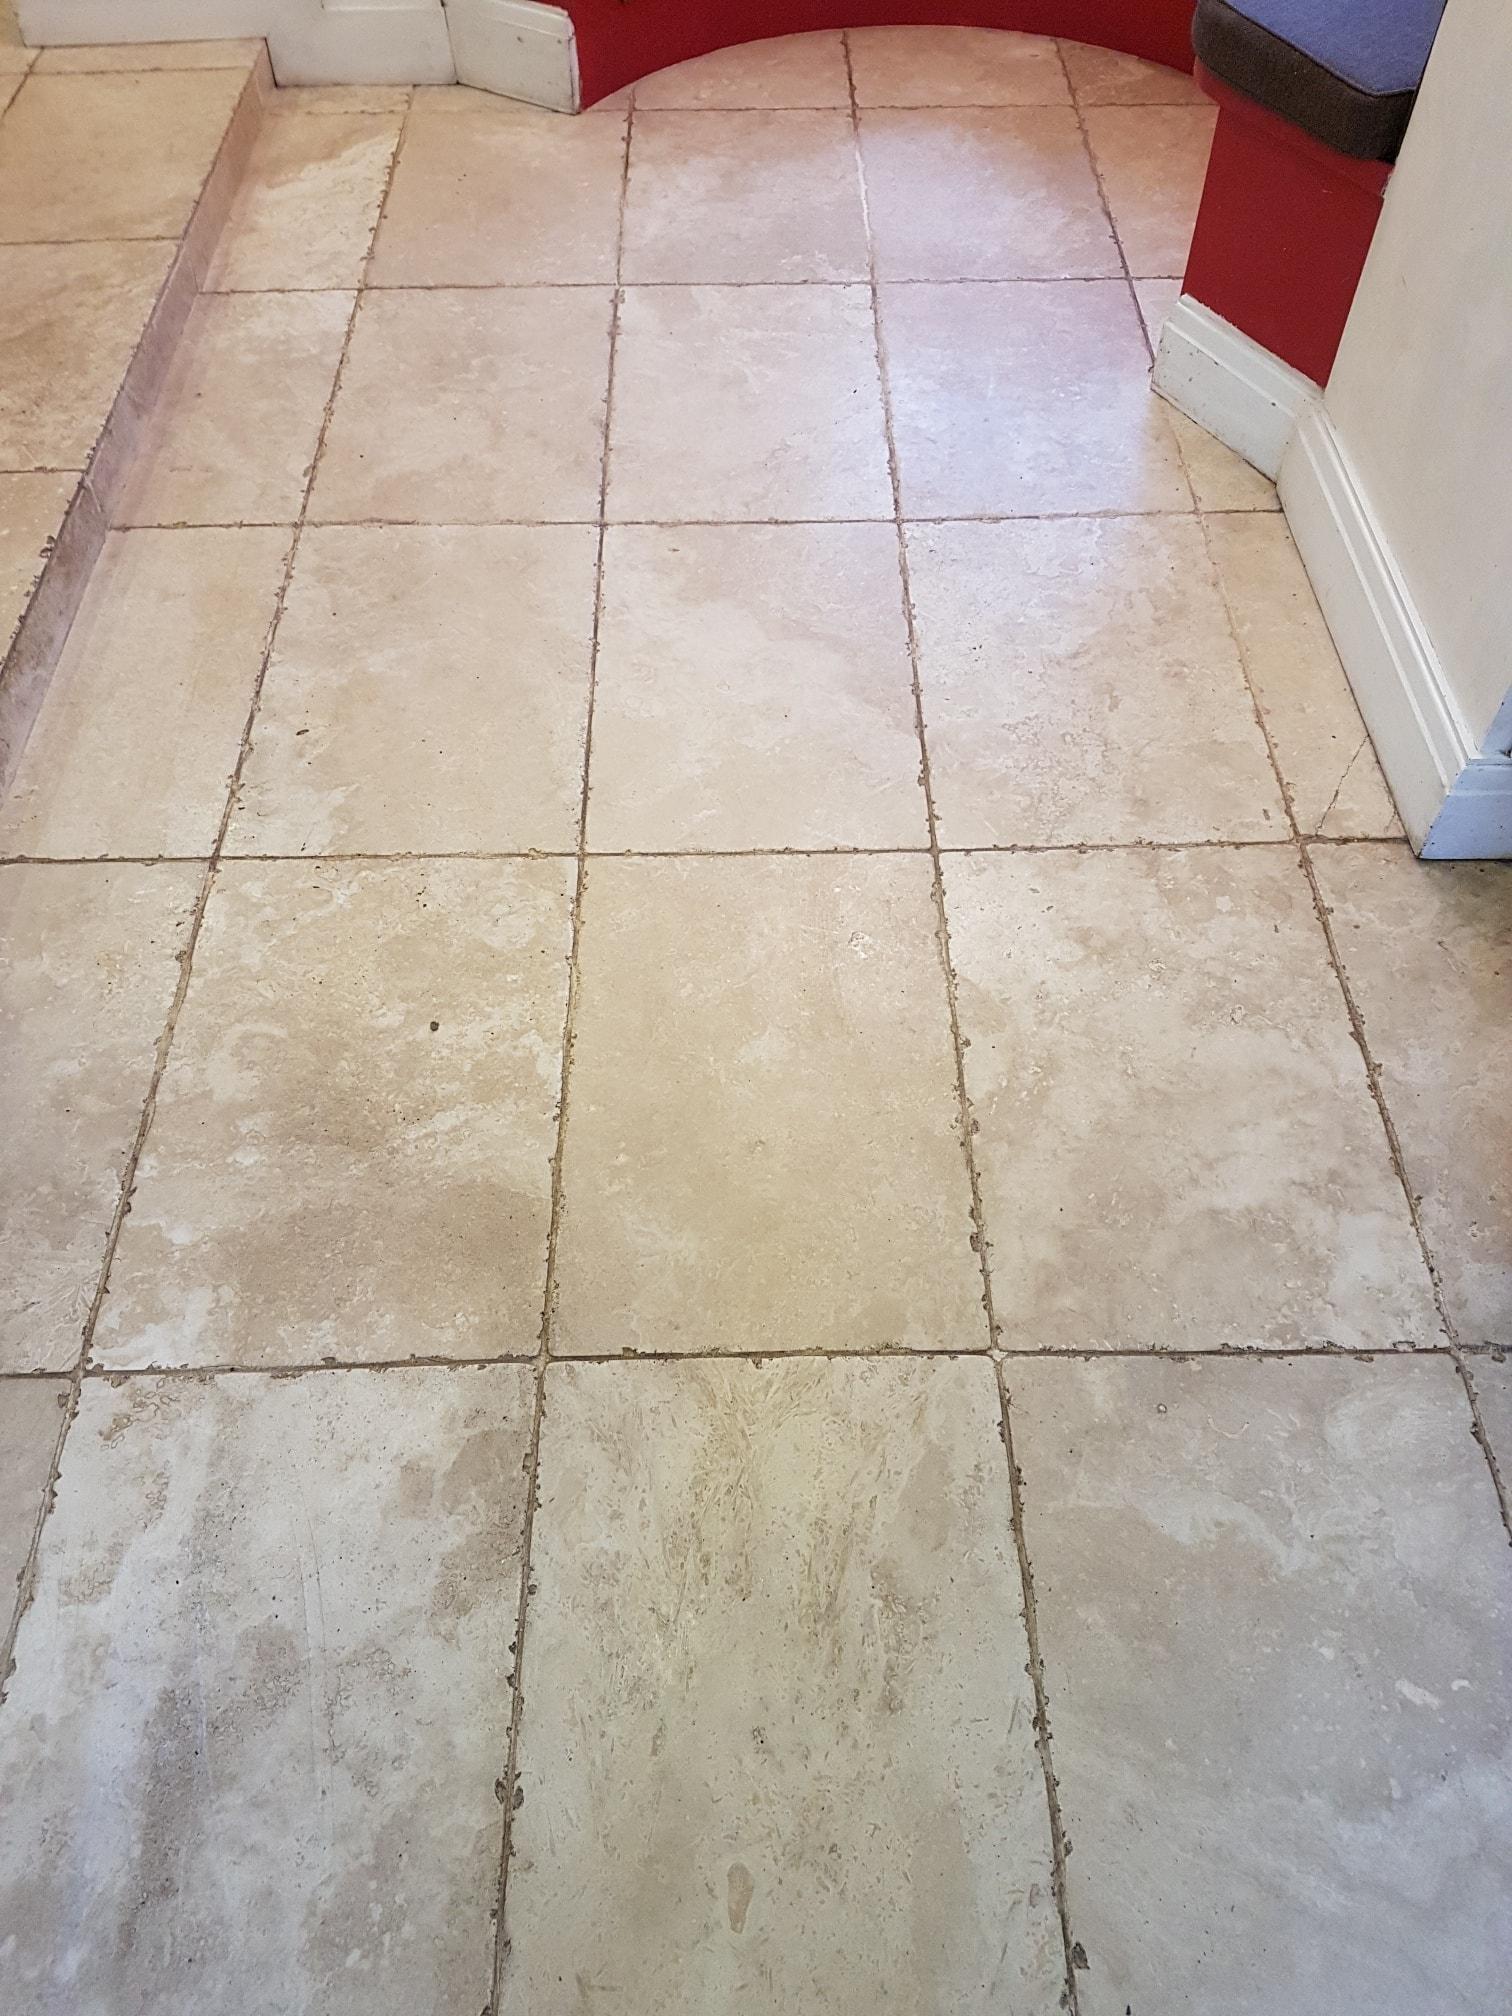 Renovating Grade A Tumbled Travertine Tiles In Ripon